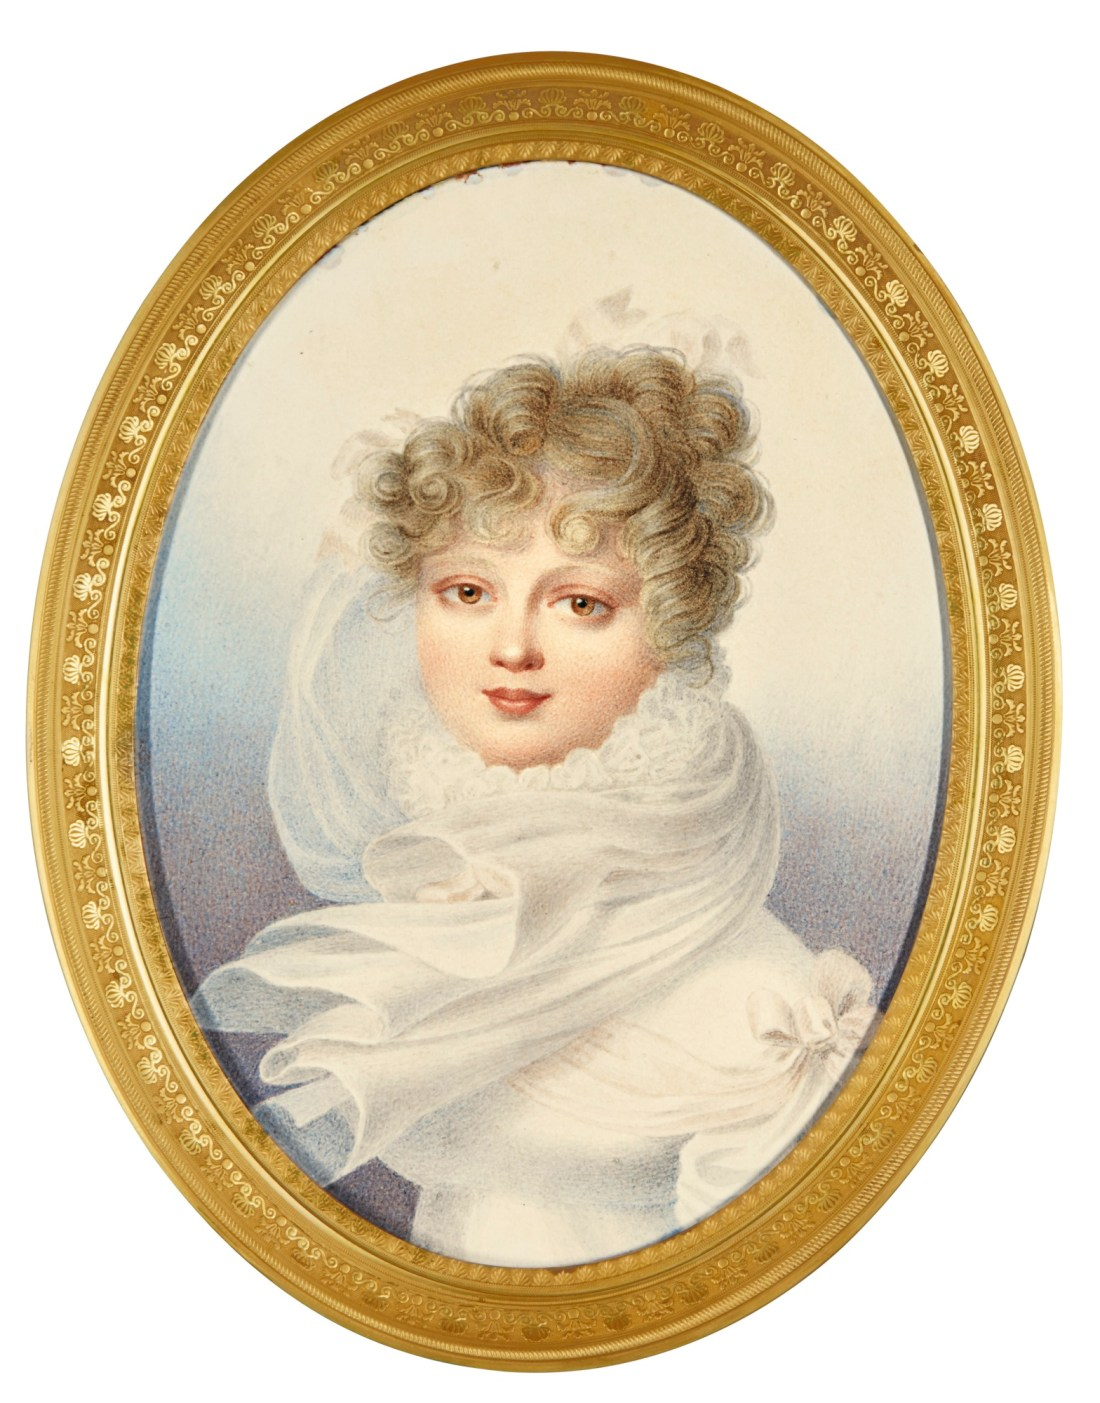 Miniature of Grand Duchess Ekaterina Pavlovna, daughter of Tsar Paul I. Later Queen of Württemberg (1788-1819). ca. 1821.